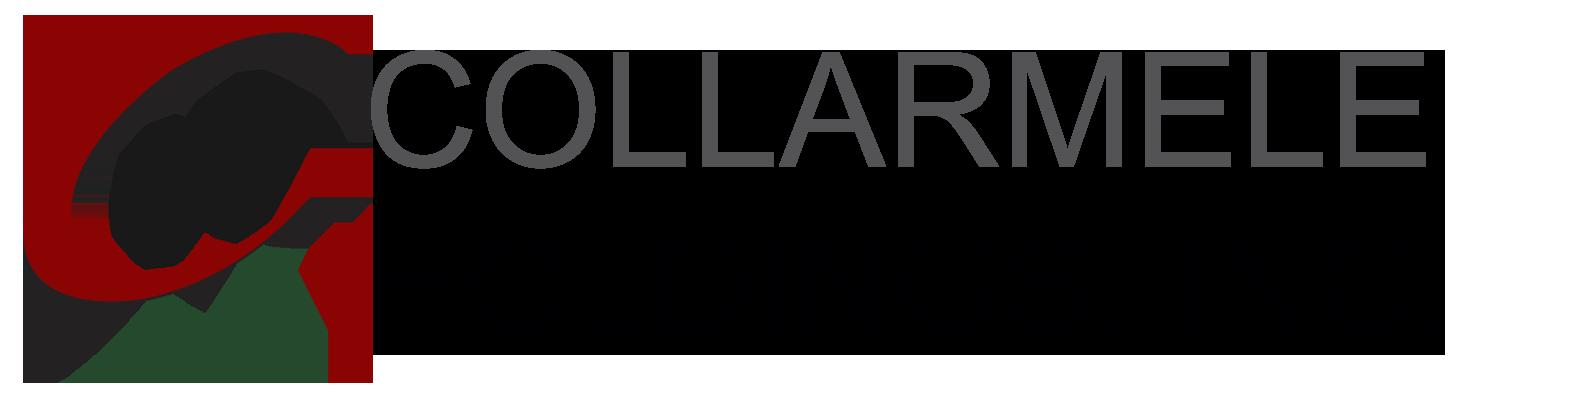 Collarmele Holdings, Inc.